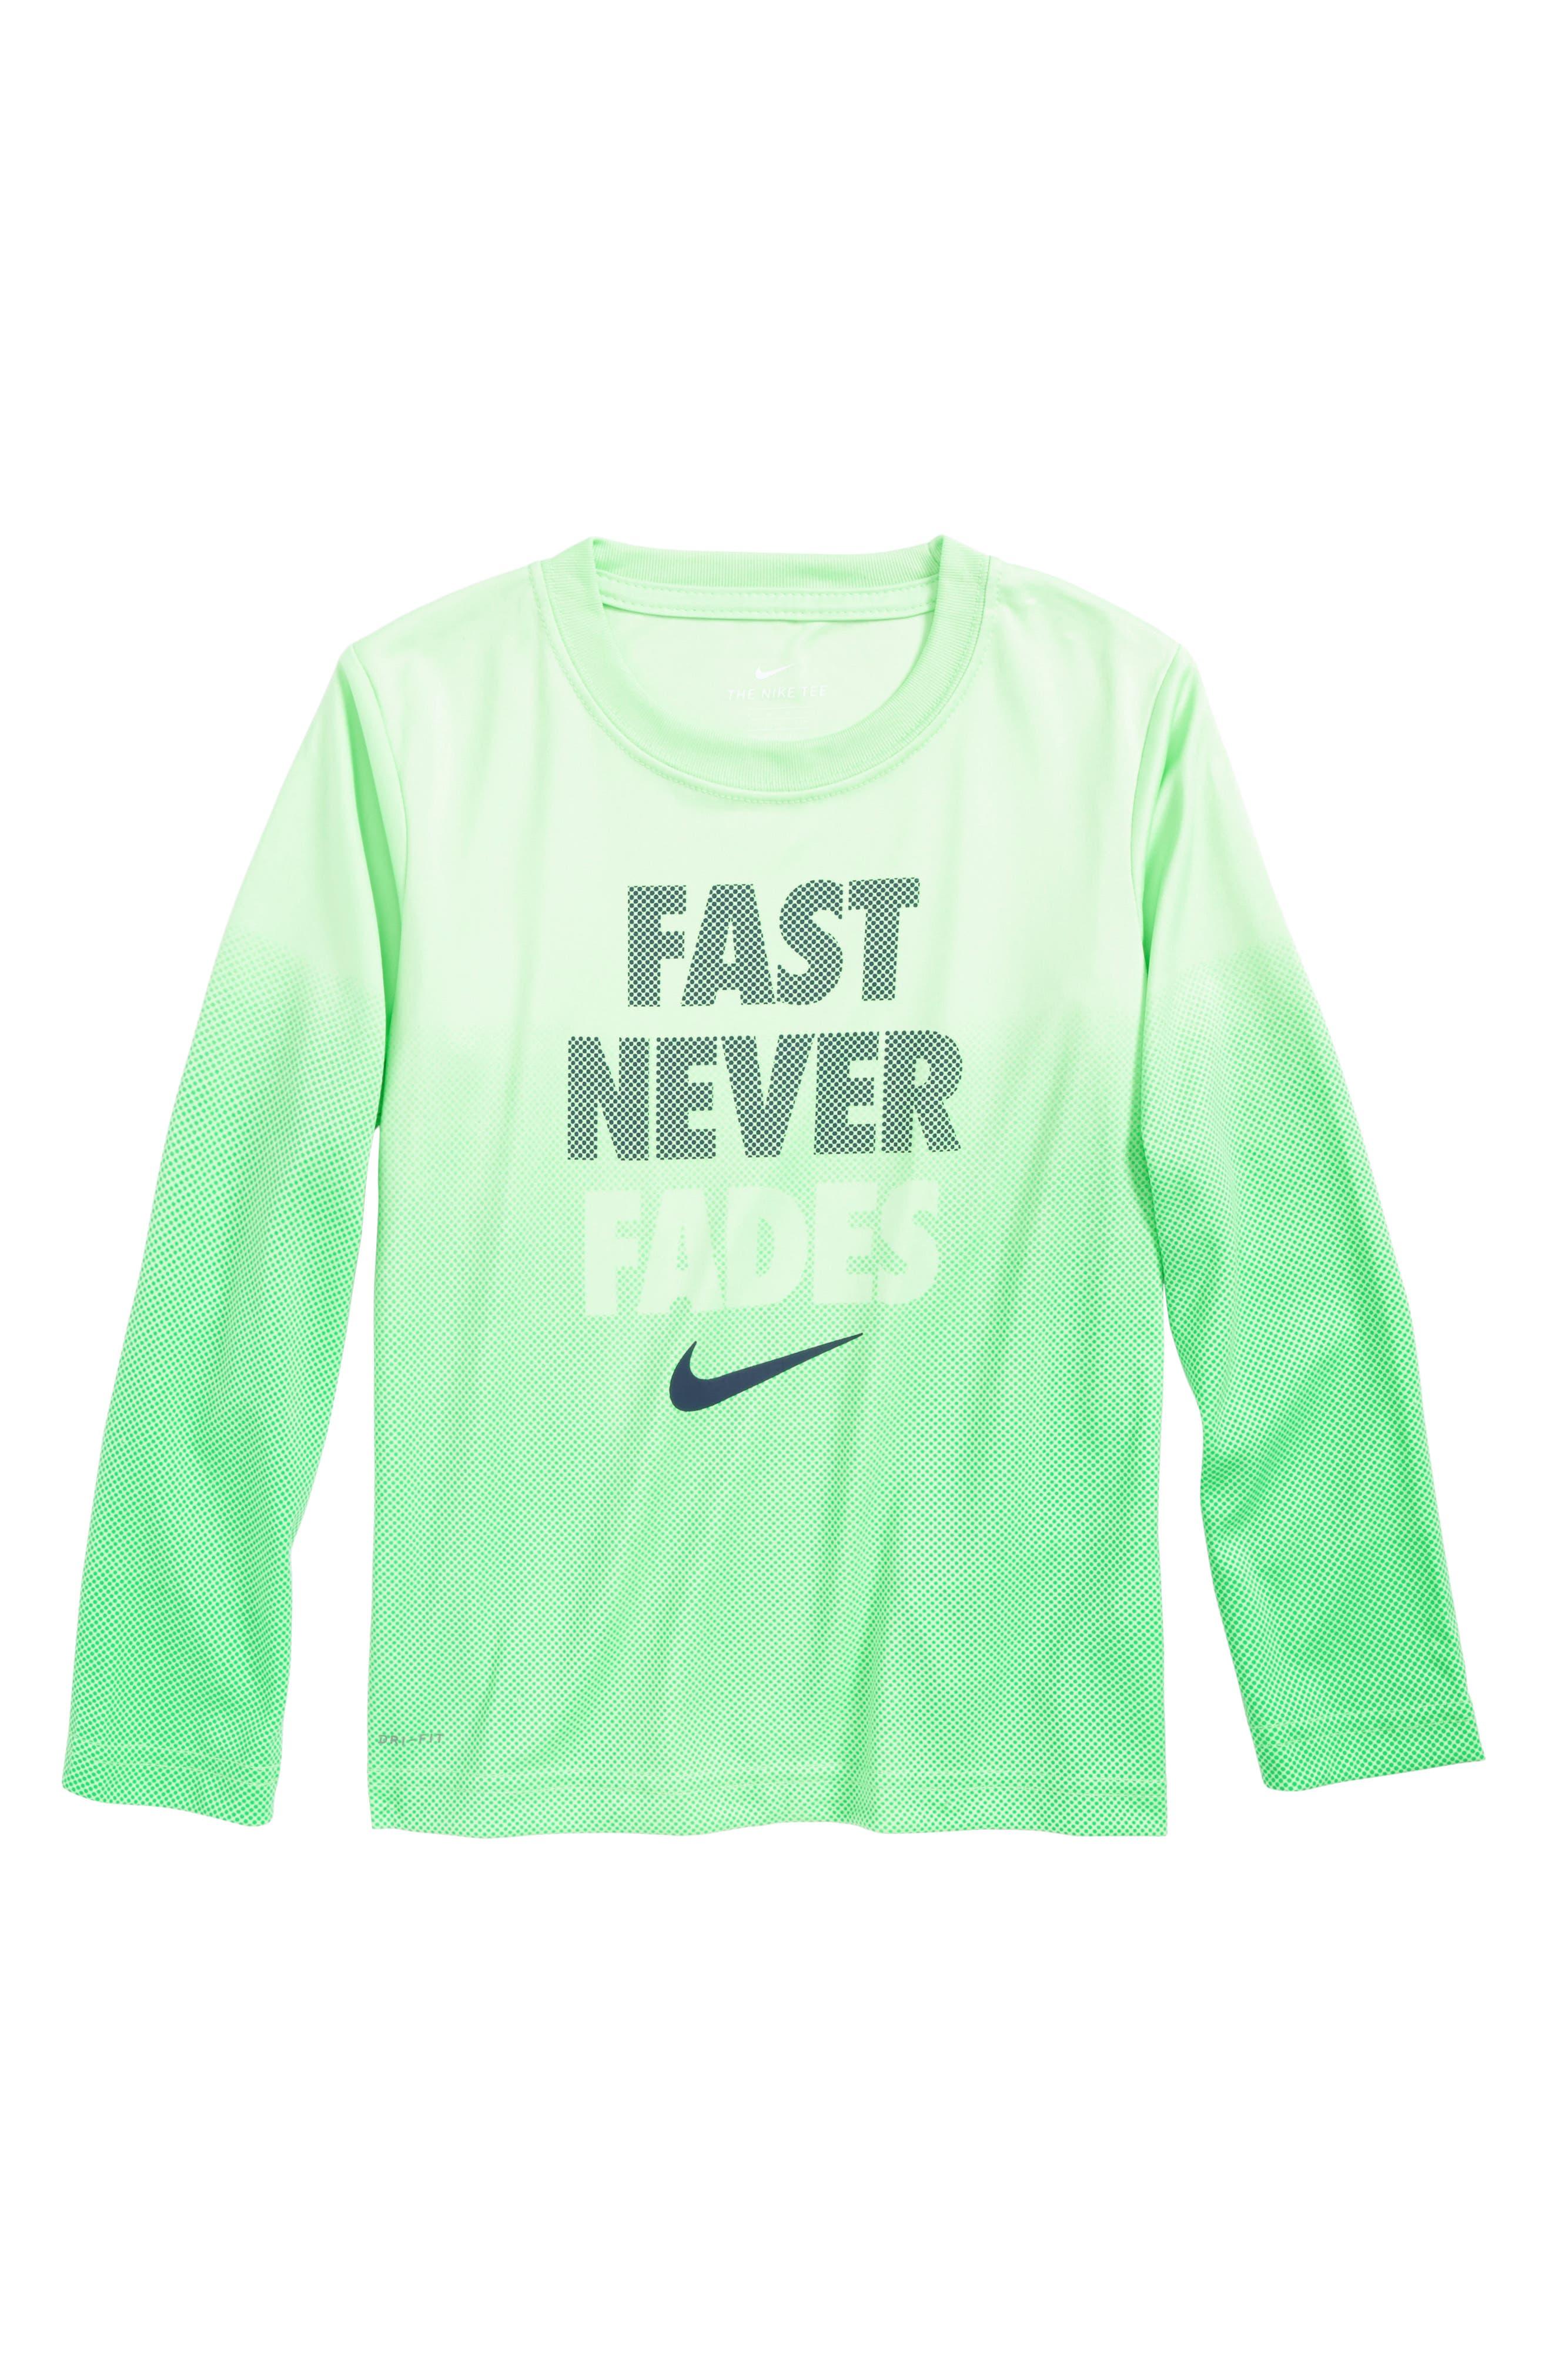 Main Image - Nike Fast Never Fades Long Sleeve T-Shirt (Toddler Boys & Little Boys)